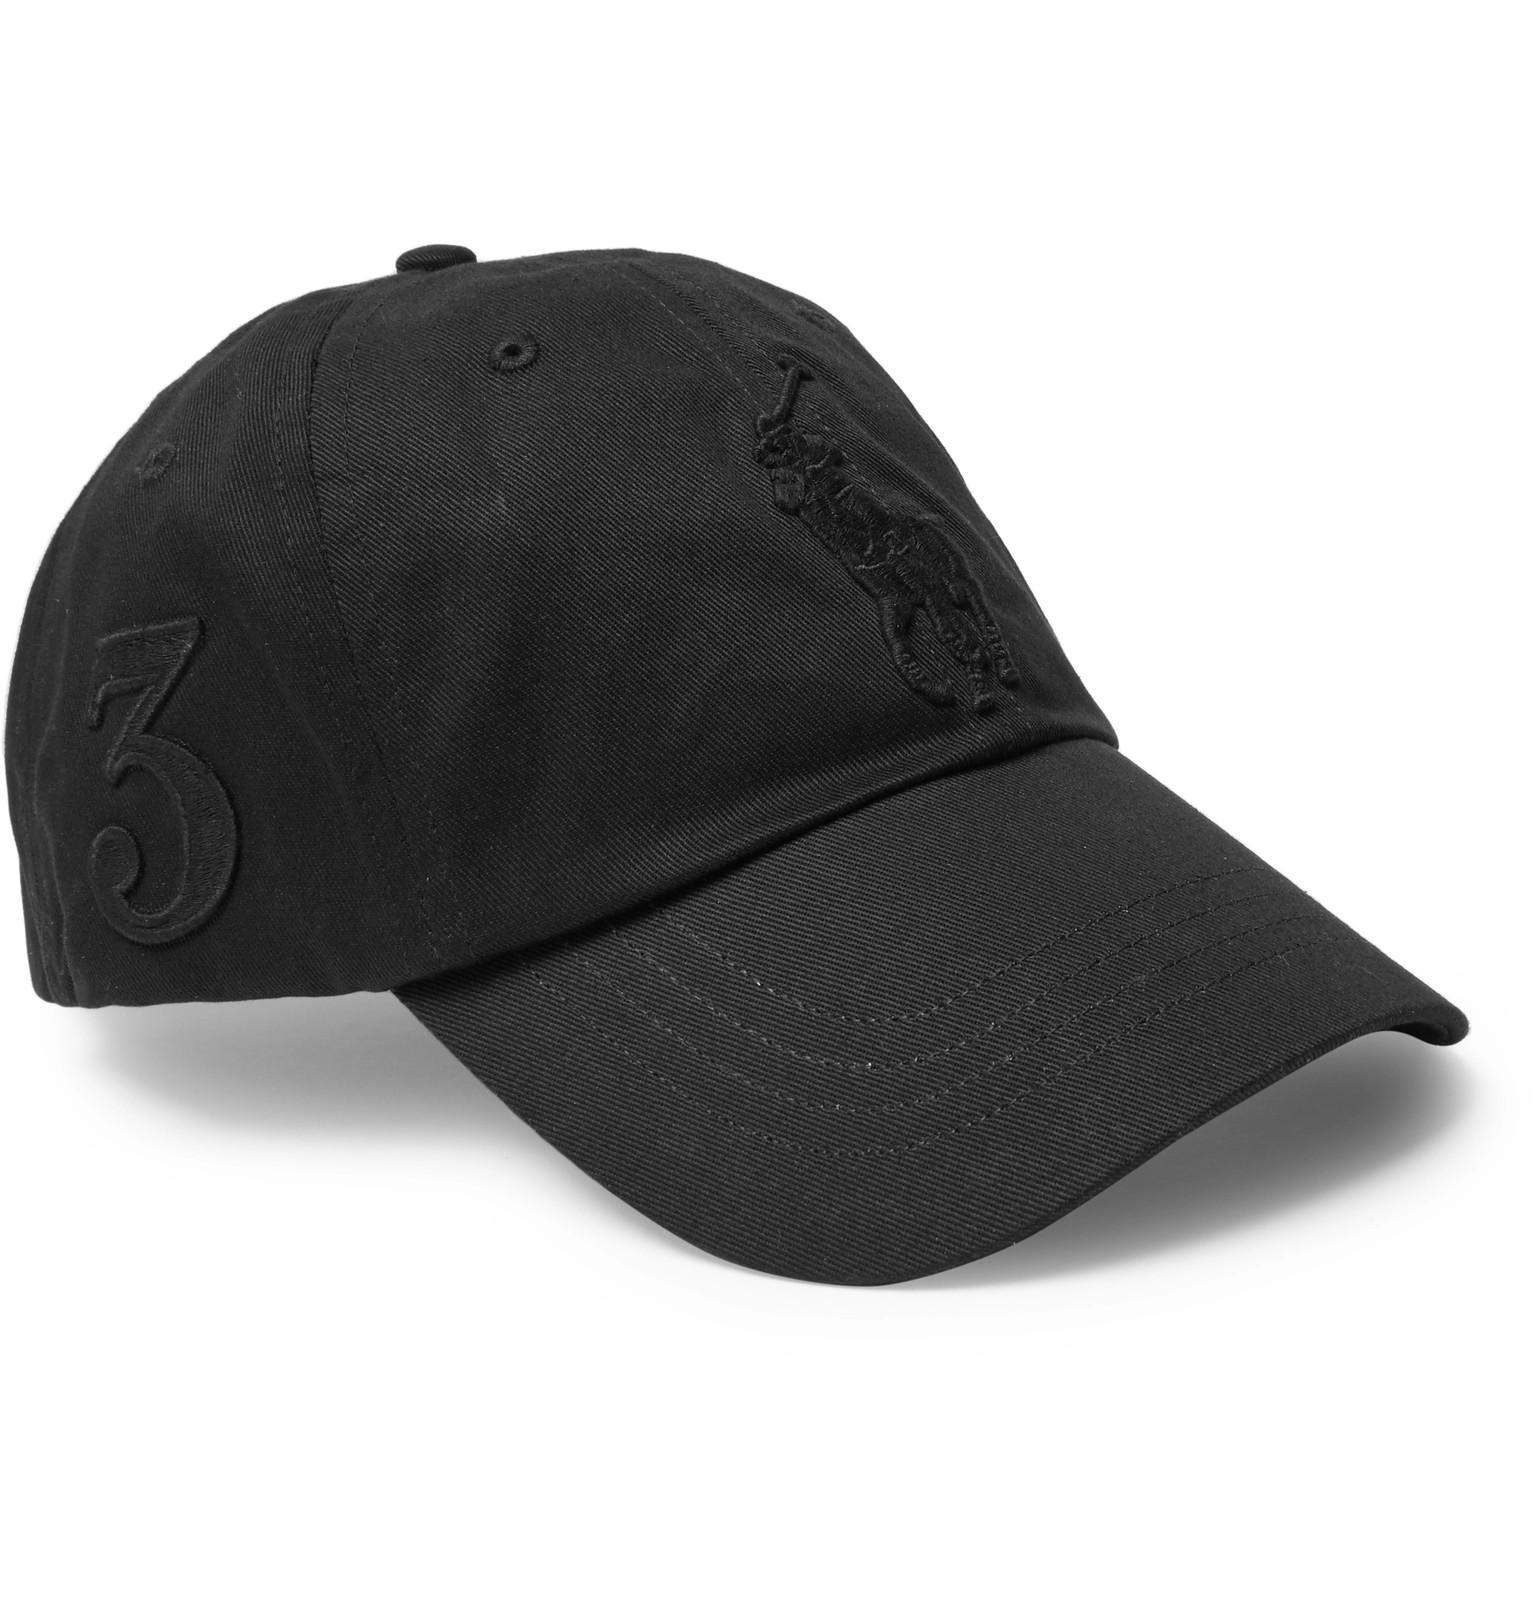 Lyst - Polo Ralph Lauren Cotton-twill Baseball Cap in Black for Men c921f21d746